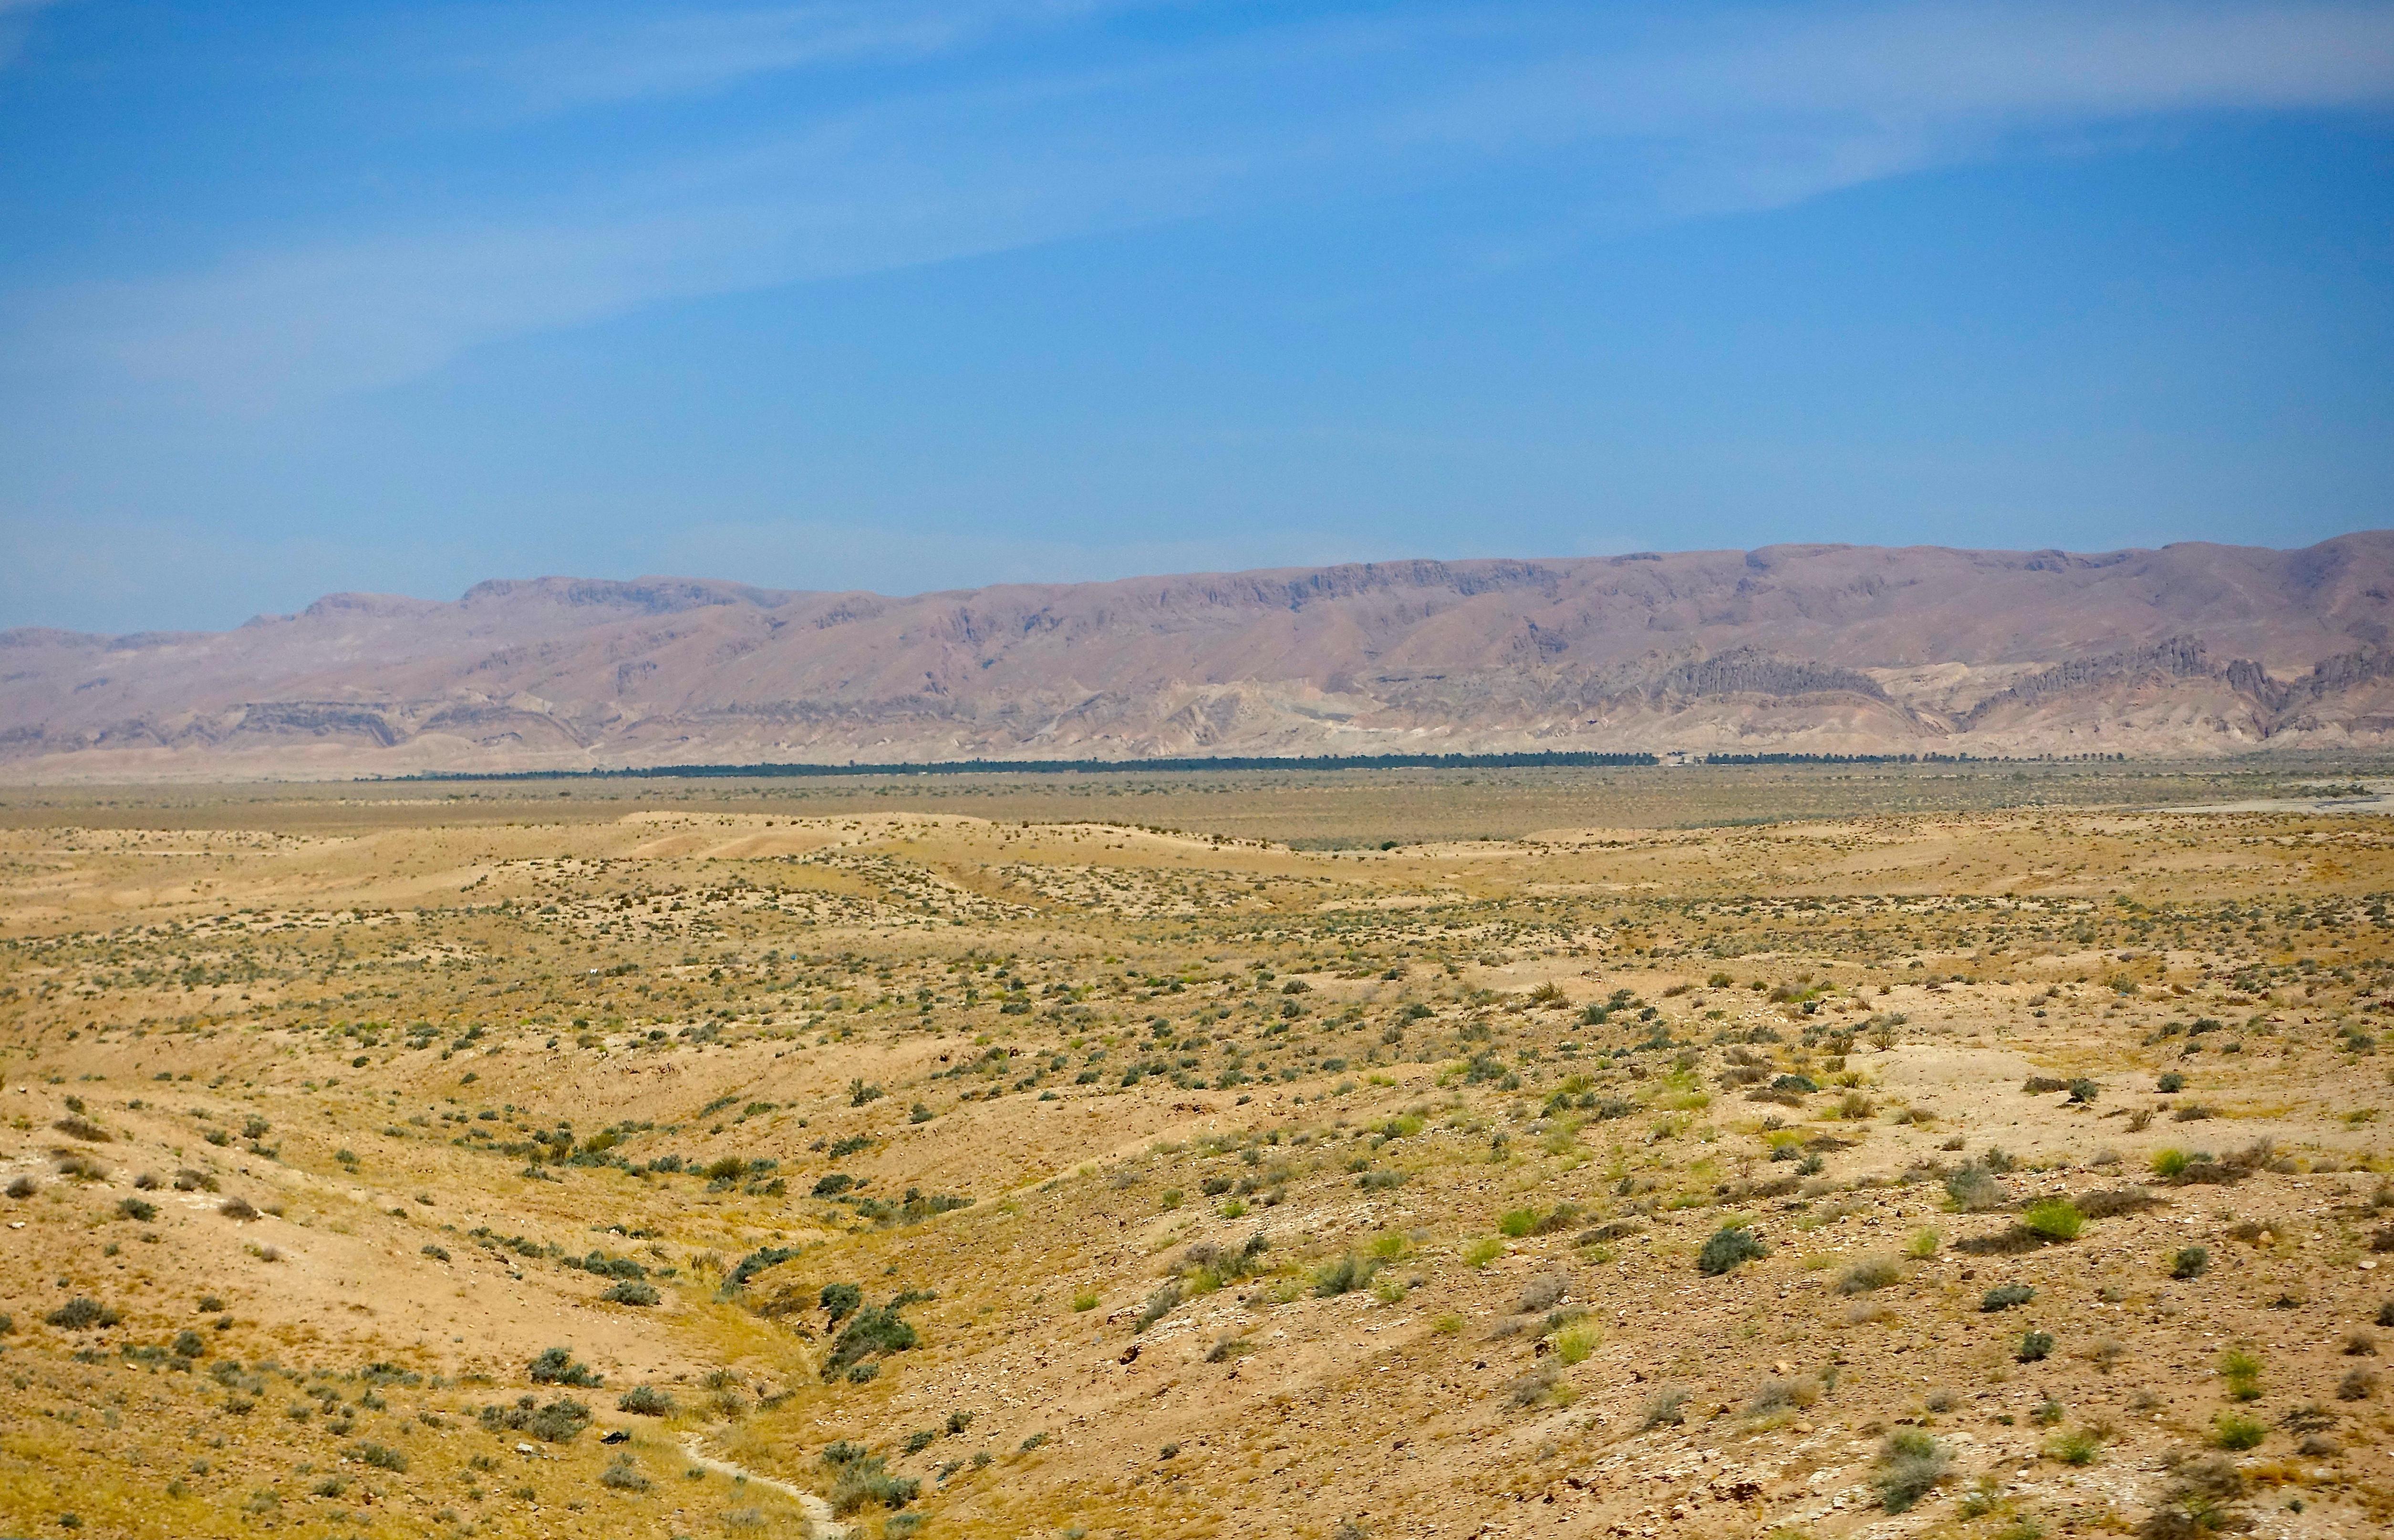 Wilderness of Tunisia